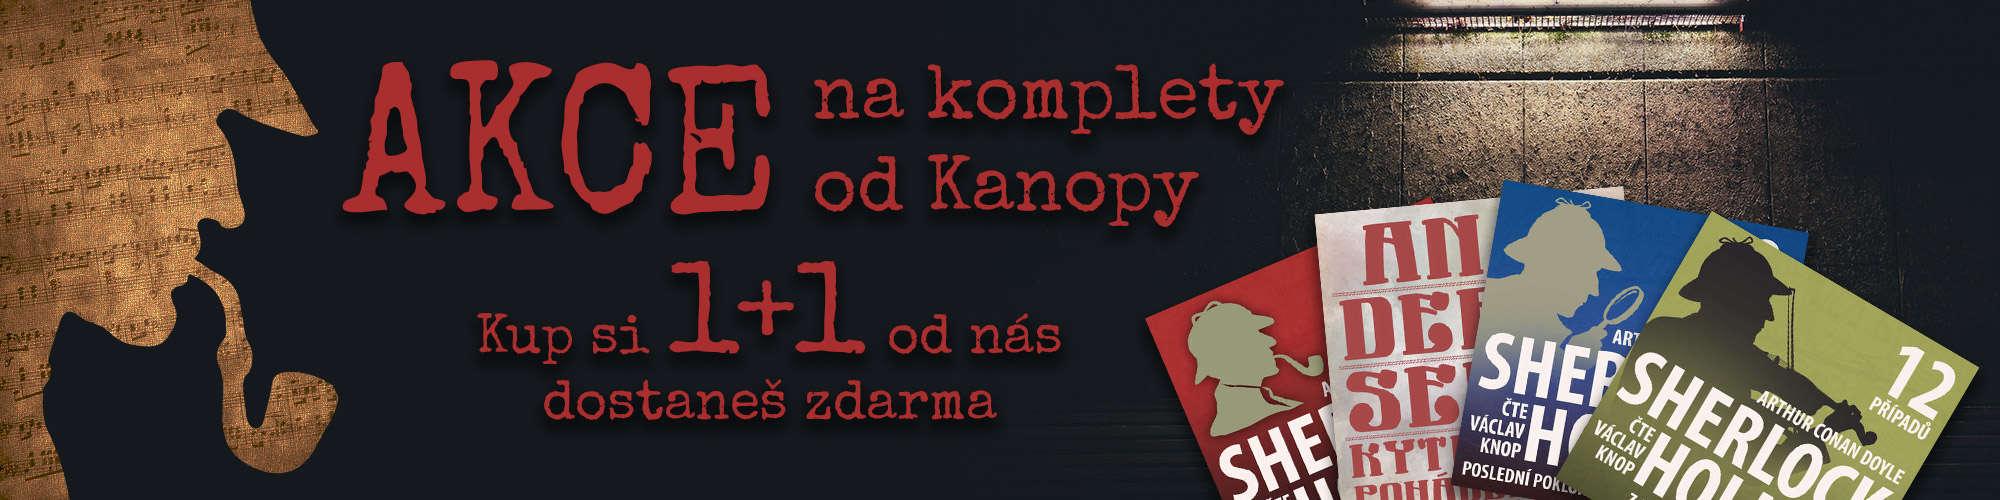 Kanopa 1+1